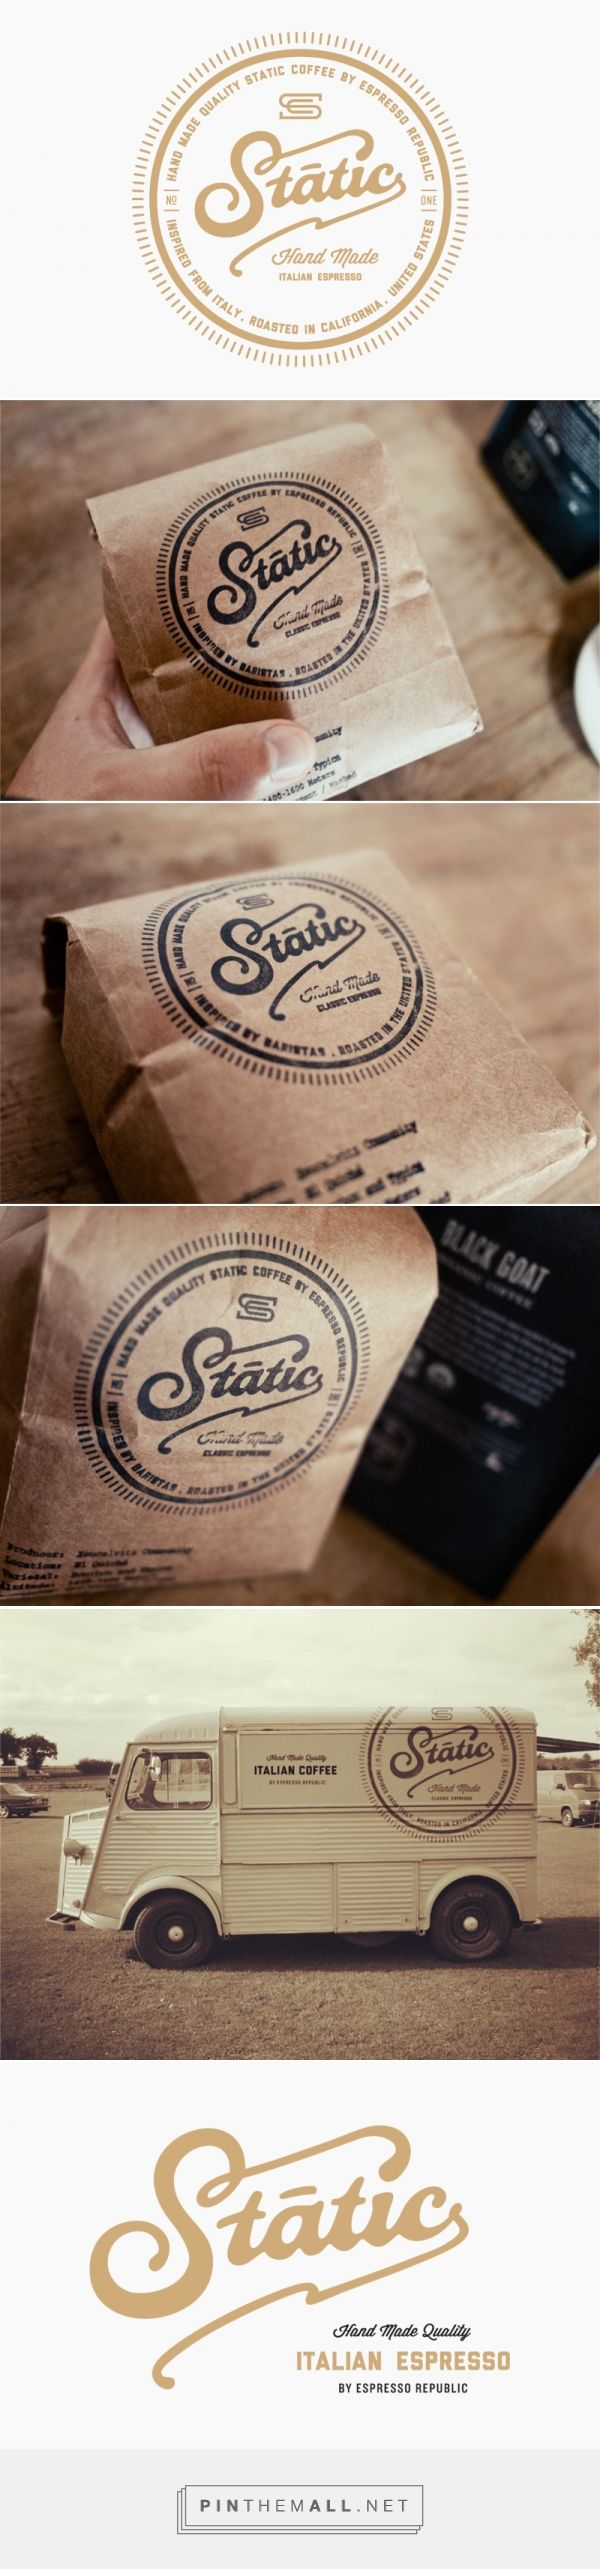 Static Coffee   Salih Kucukaga Design Studio